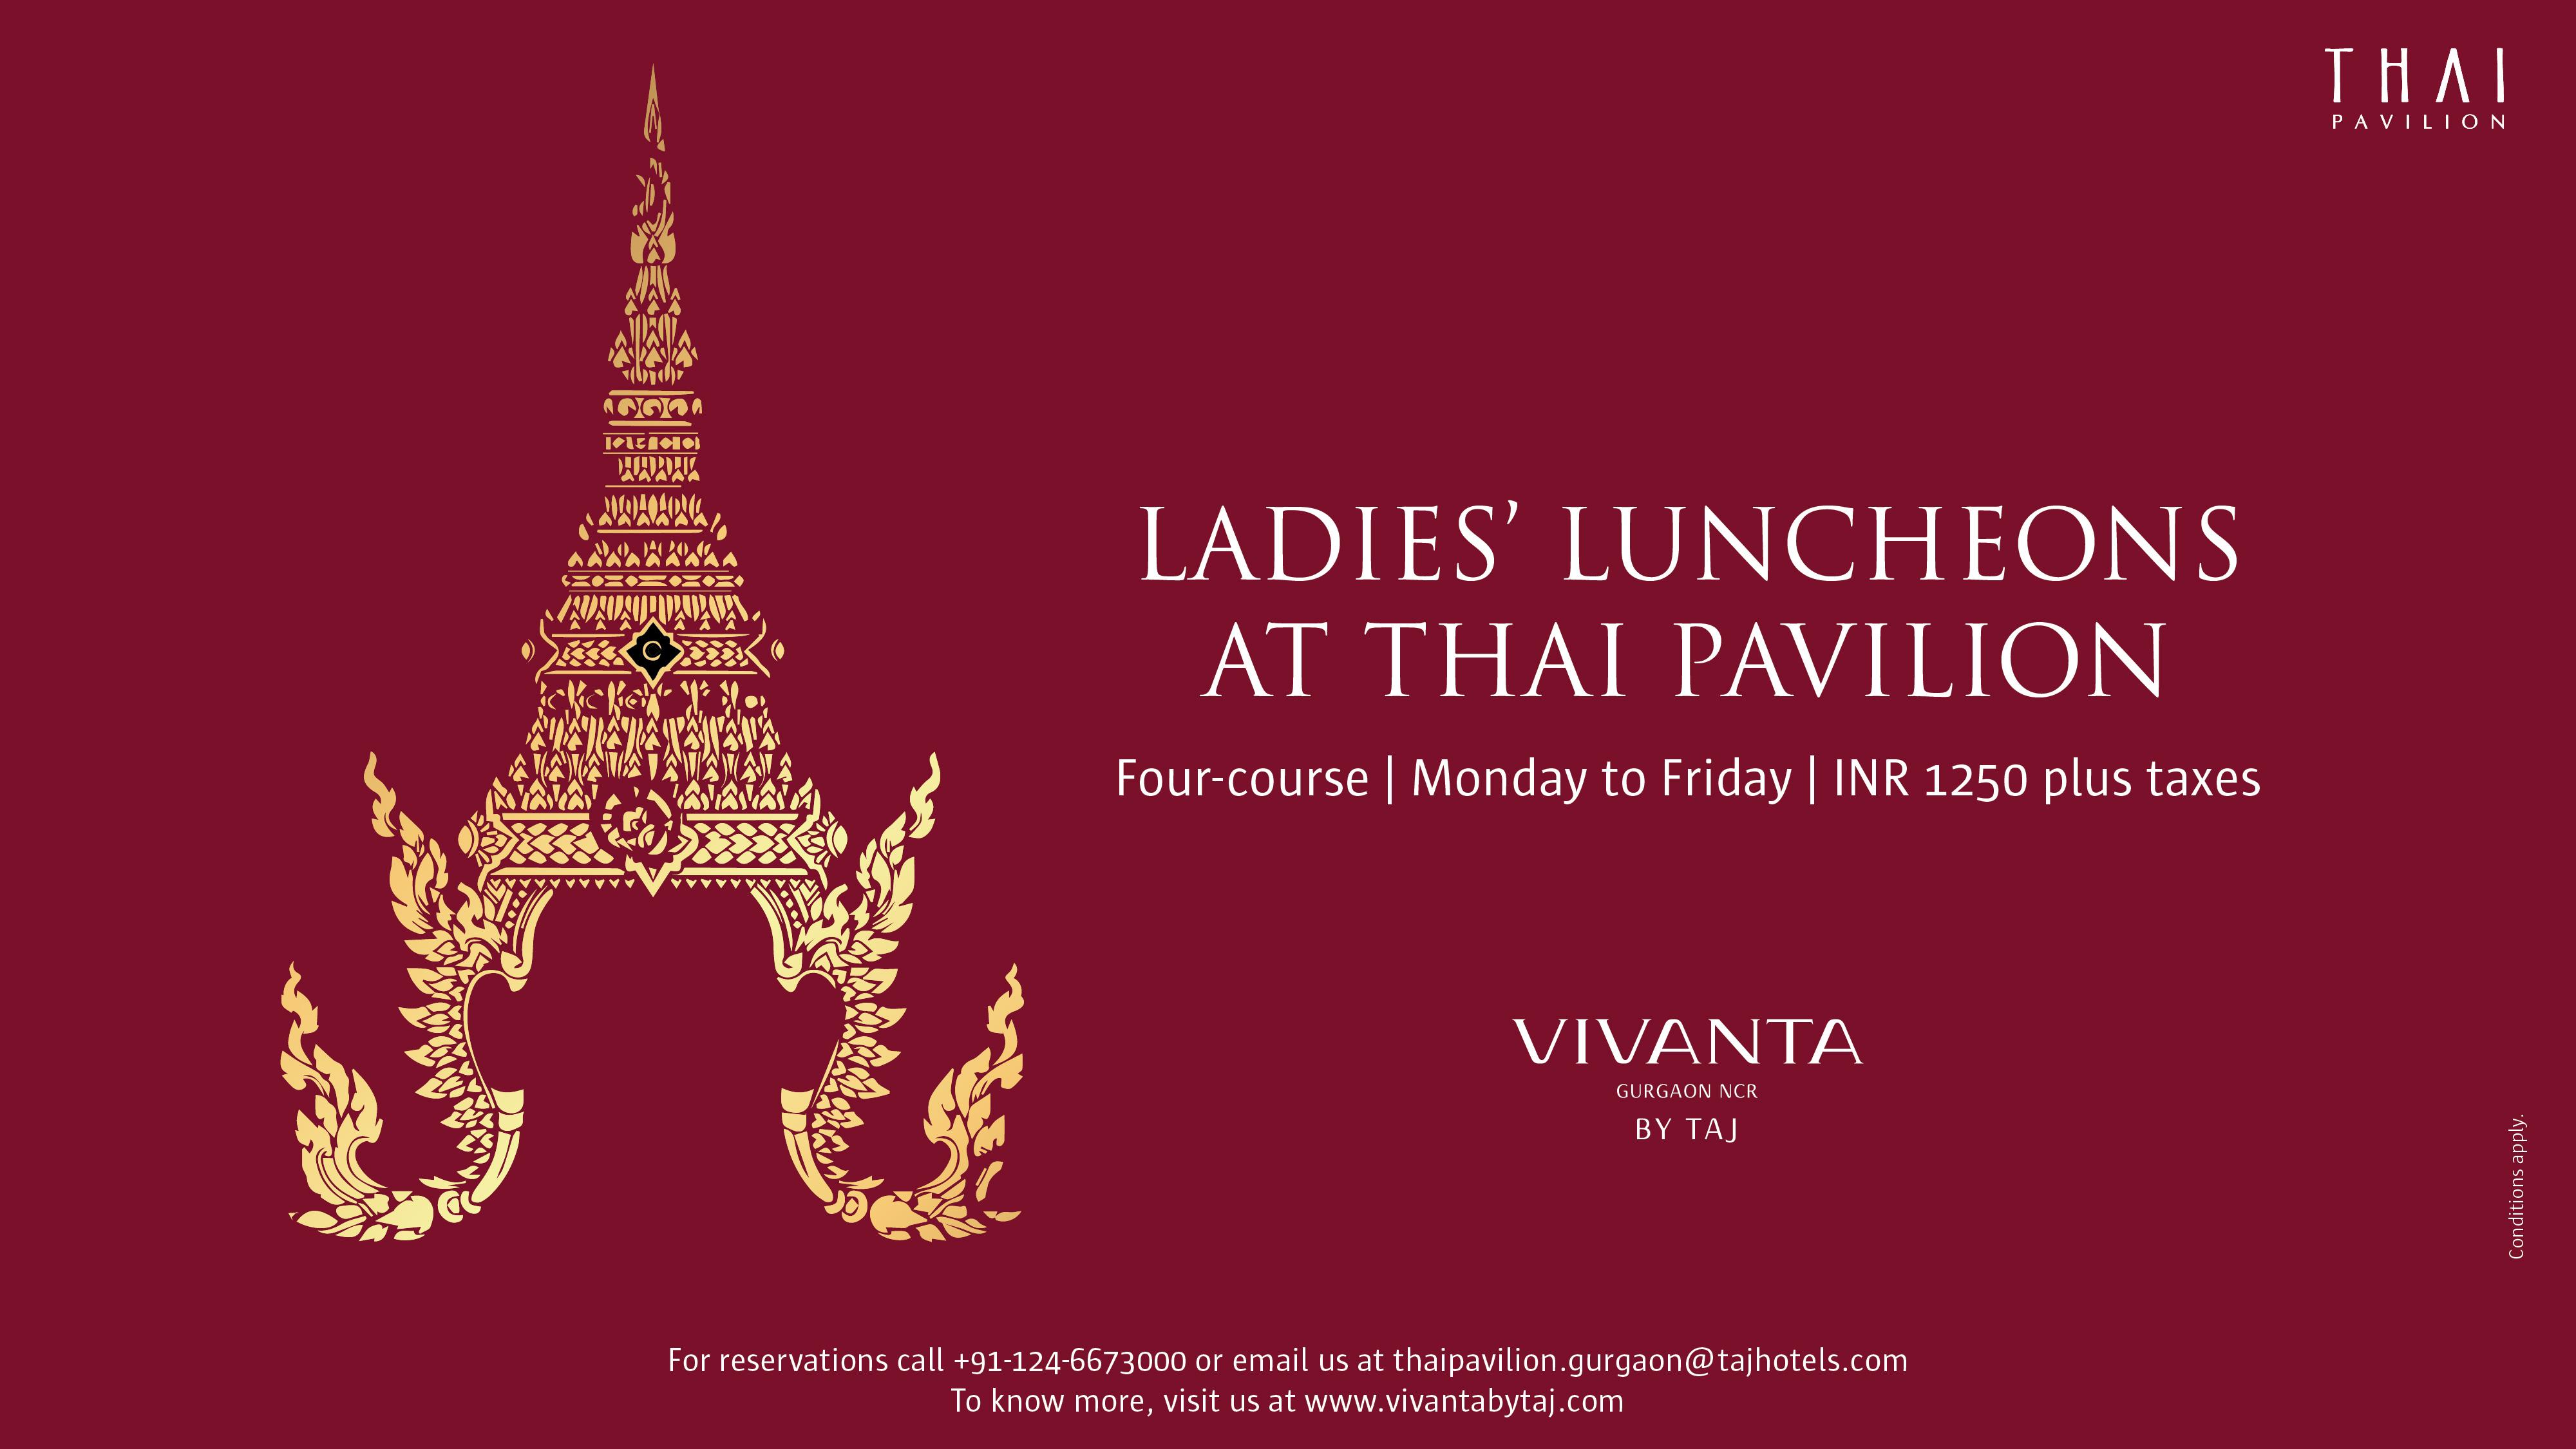 Ladies' Luncheons at Thai Pavilion